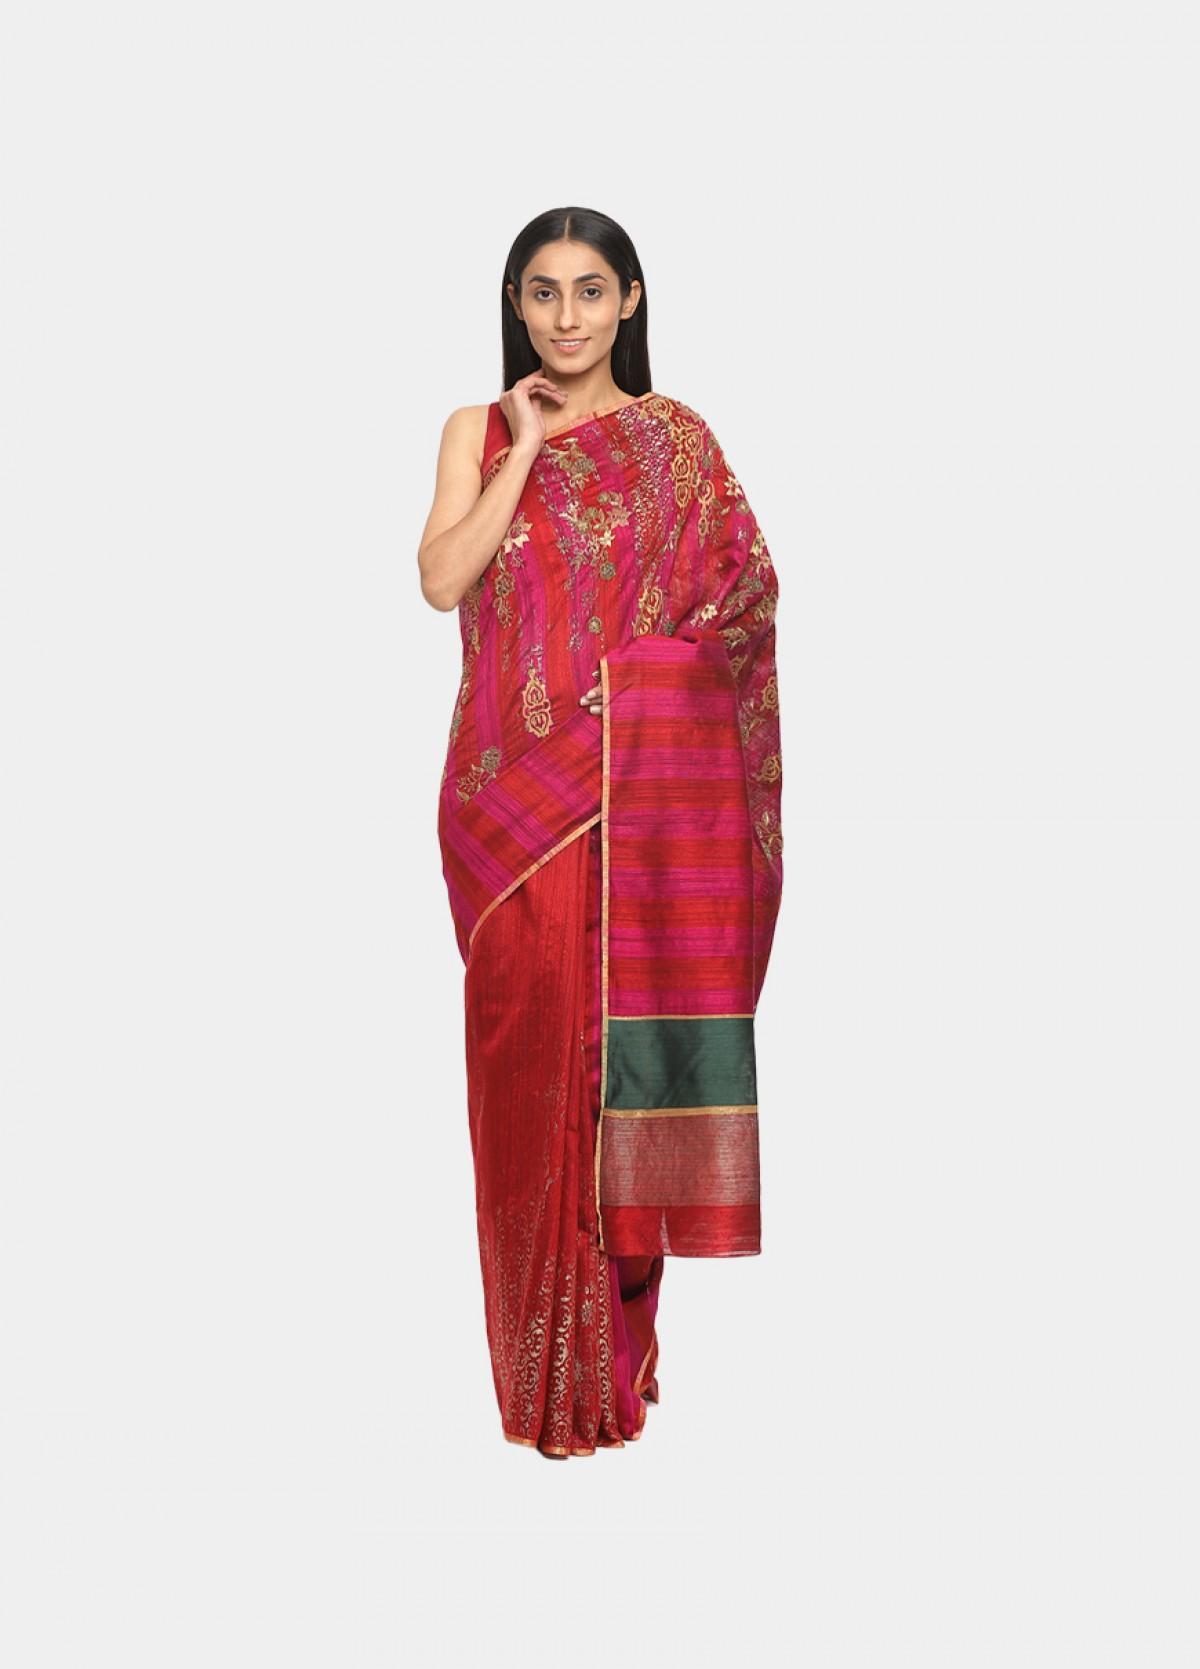 The Orange Banarasi Silk Embroidered Sari